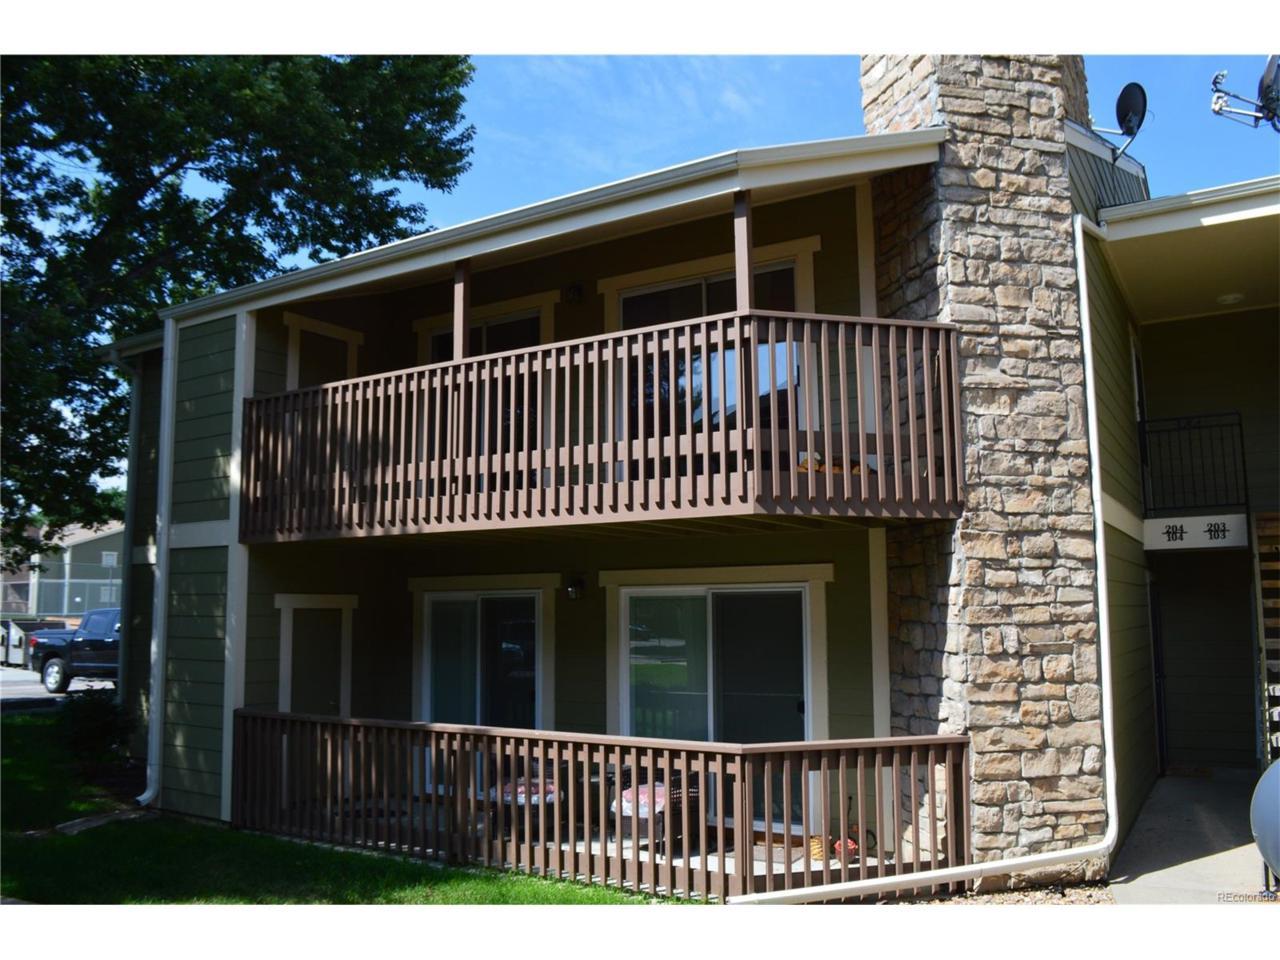 3450 S Eagle Street #204, Aurora, CO 80014 (MLS #8112918) :: 8z Real Estate